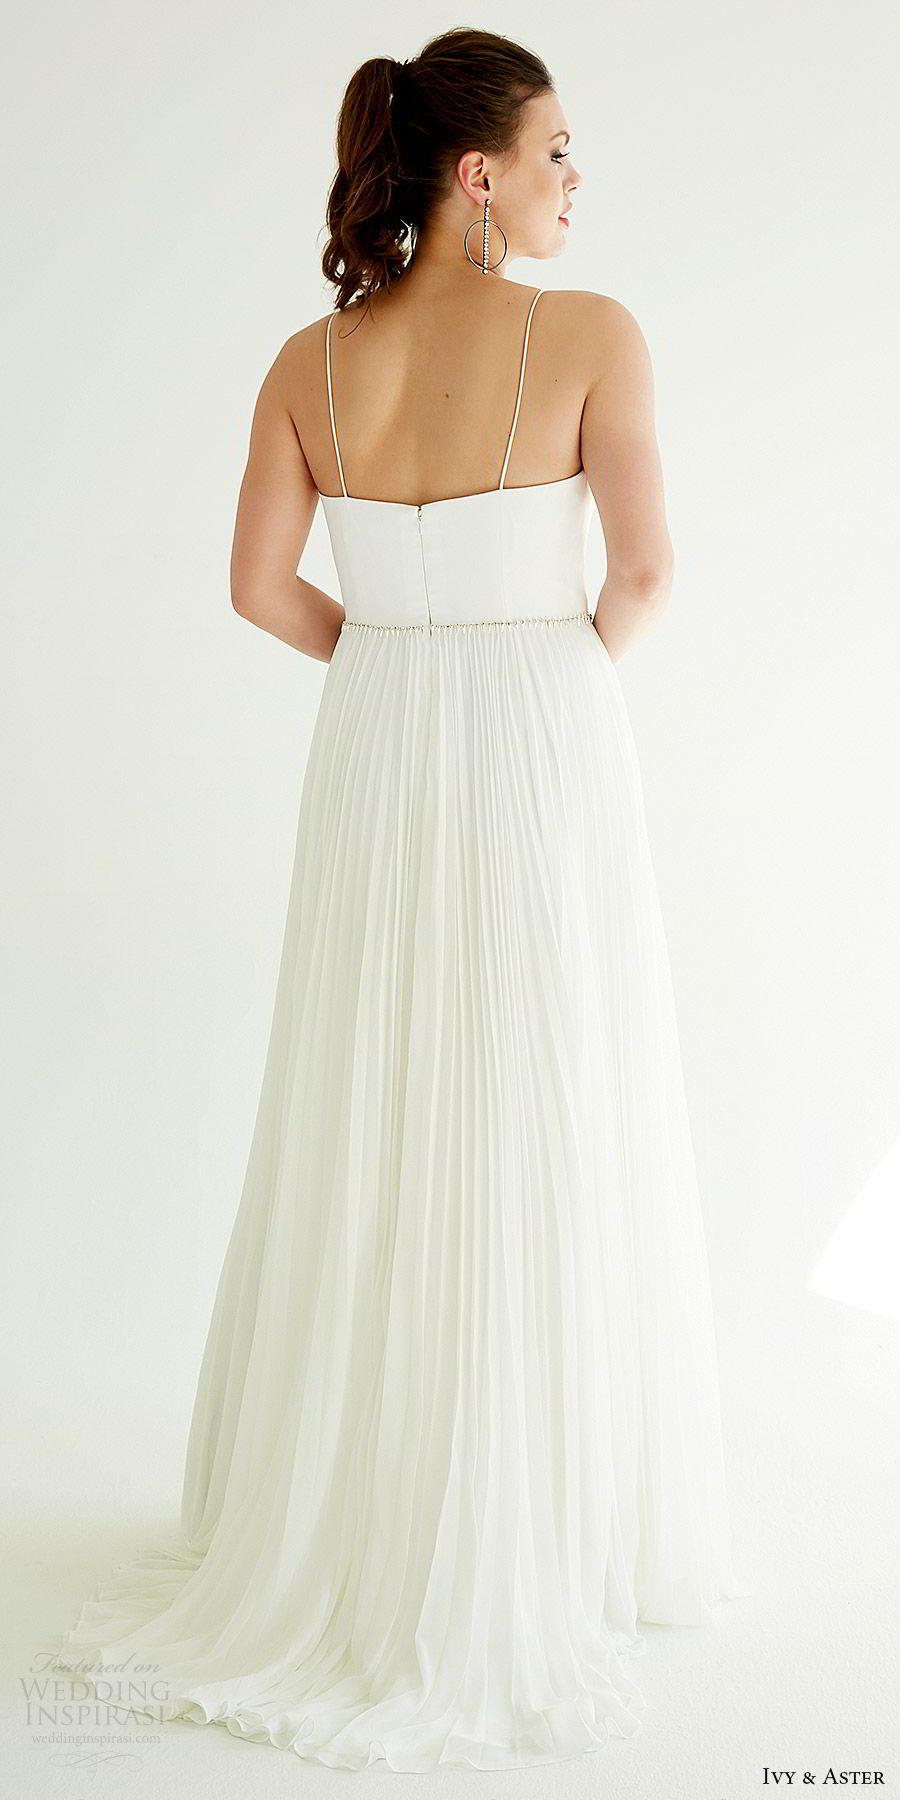 ivy aster bridal 2019 sleeveless spaghetti straps deep v neck clean bodice pleated a line skirt wedding dress (dakota) bv sweep train minimal modern